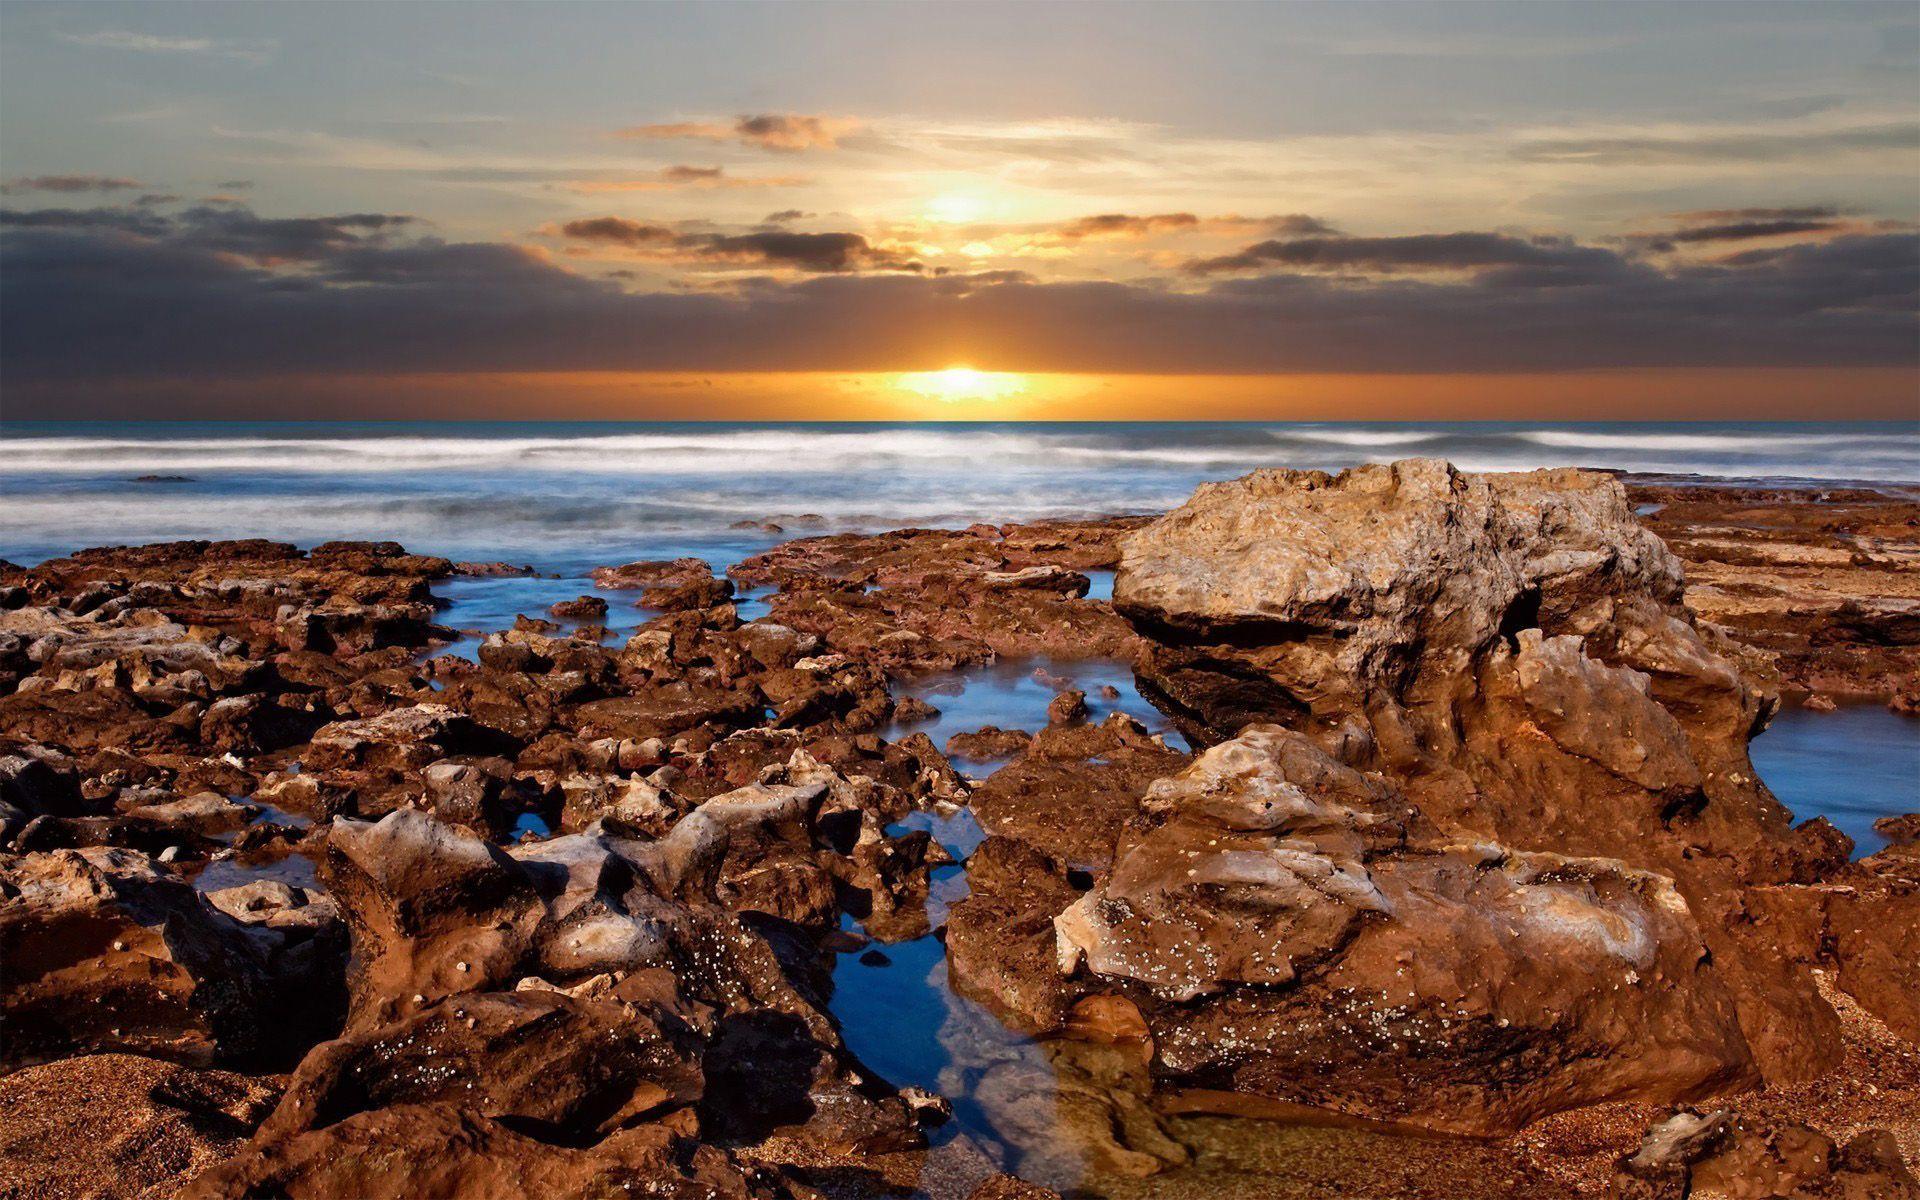 Rocky Beach 003 Wallpaper - Oil Paintings Art Landscape Nature - HD Wallpaper